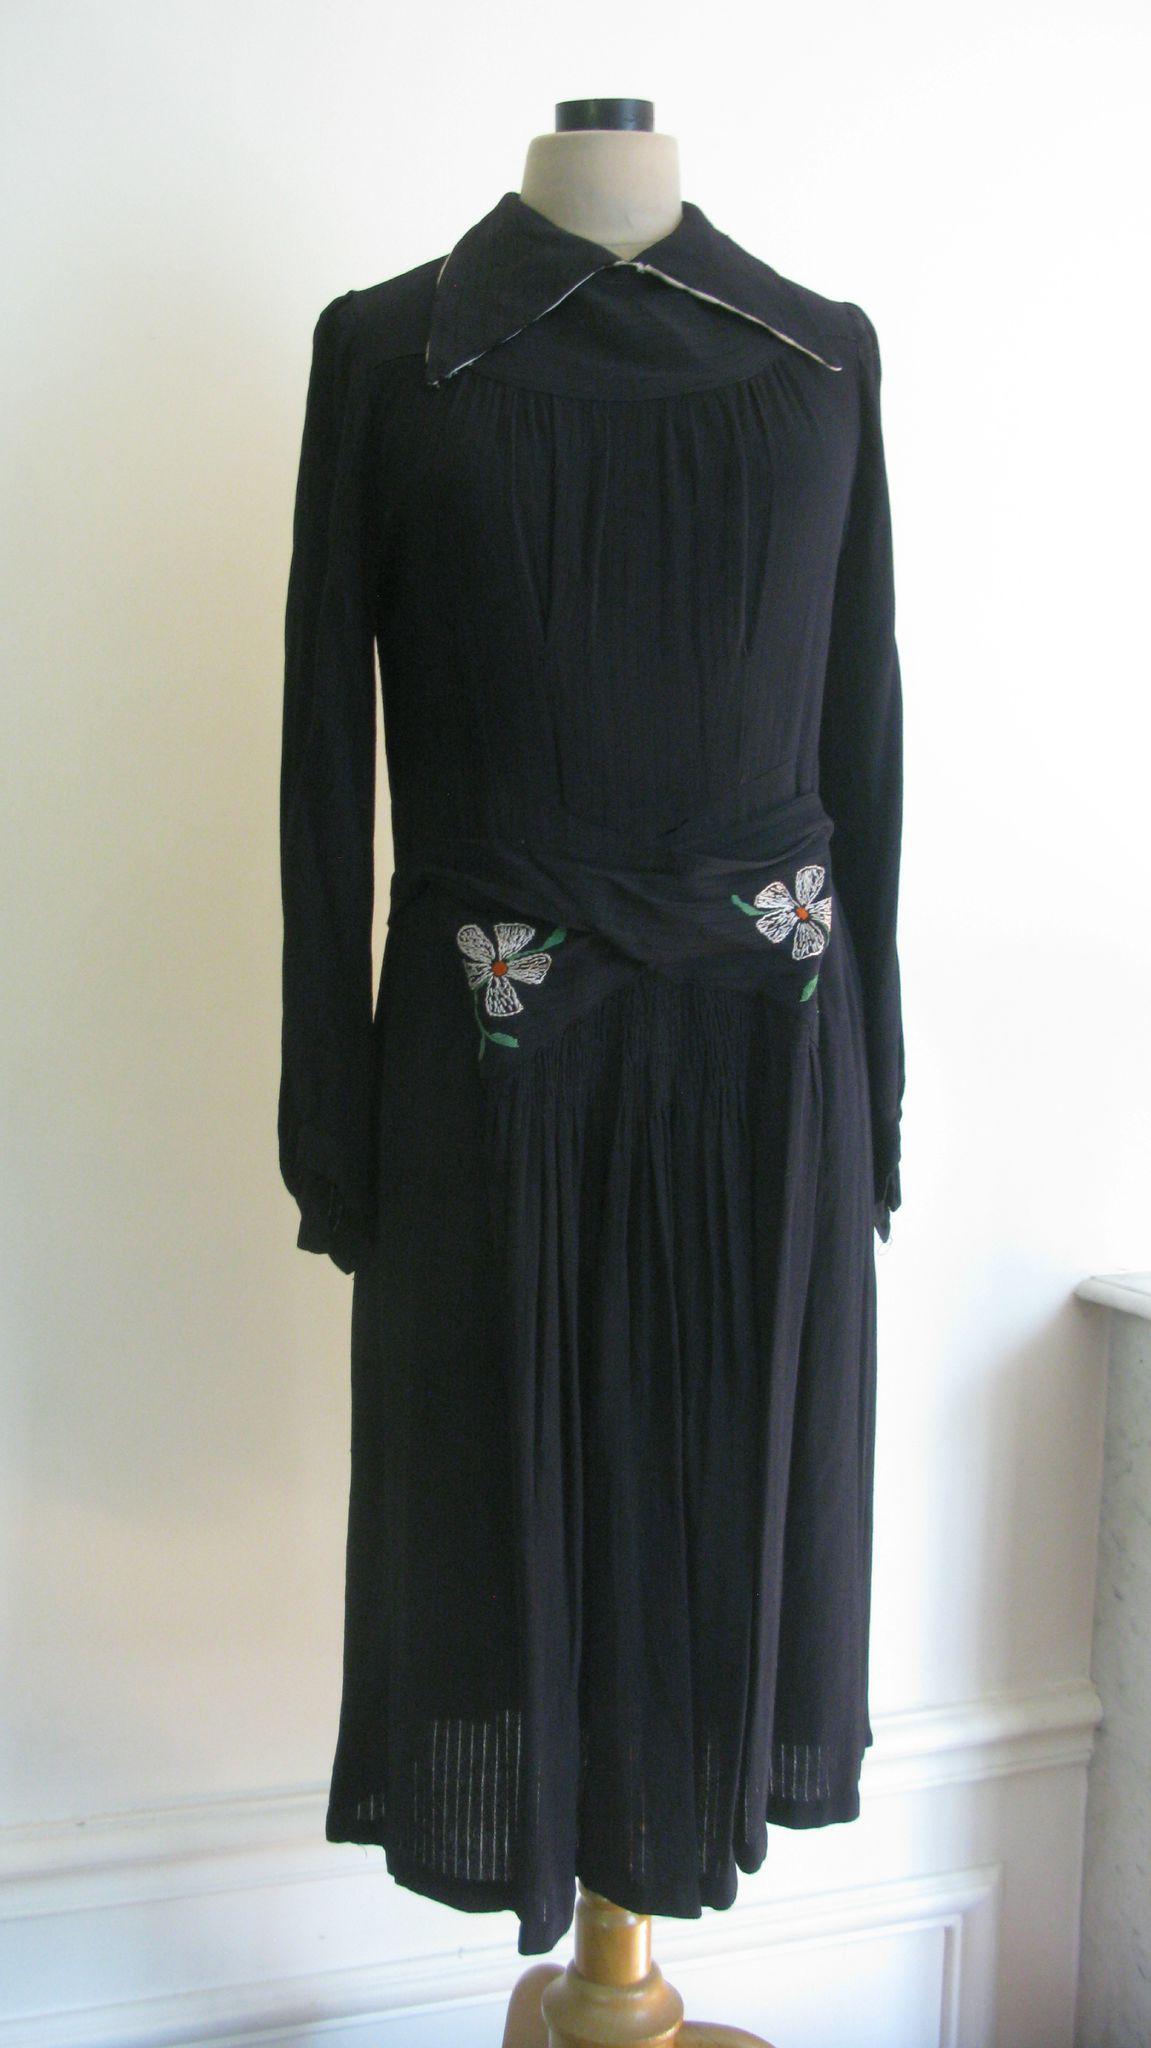 2204 vintage ann es 30 robe bleu marine en cr pe de soie t 38 les jolies robes - Robe des annees 30 ...